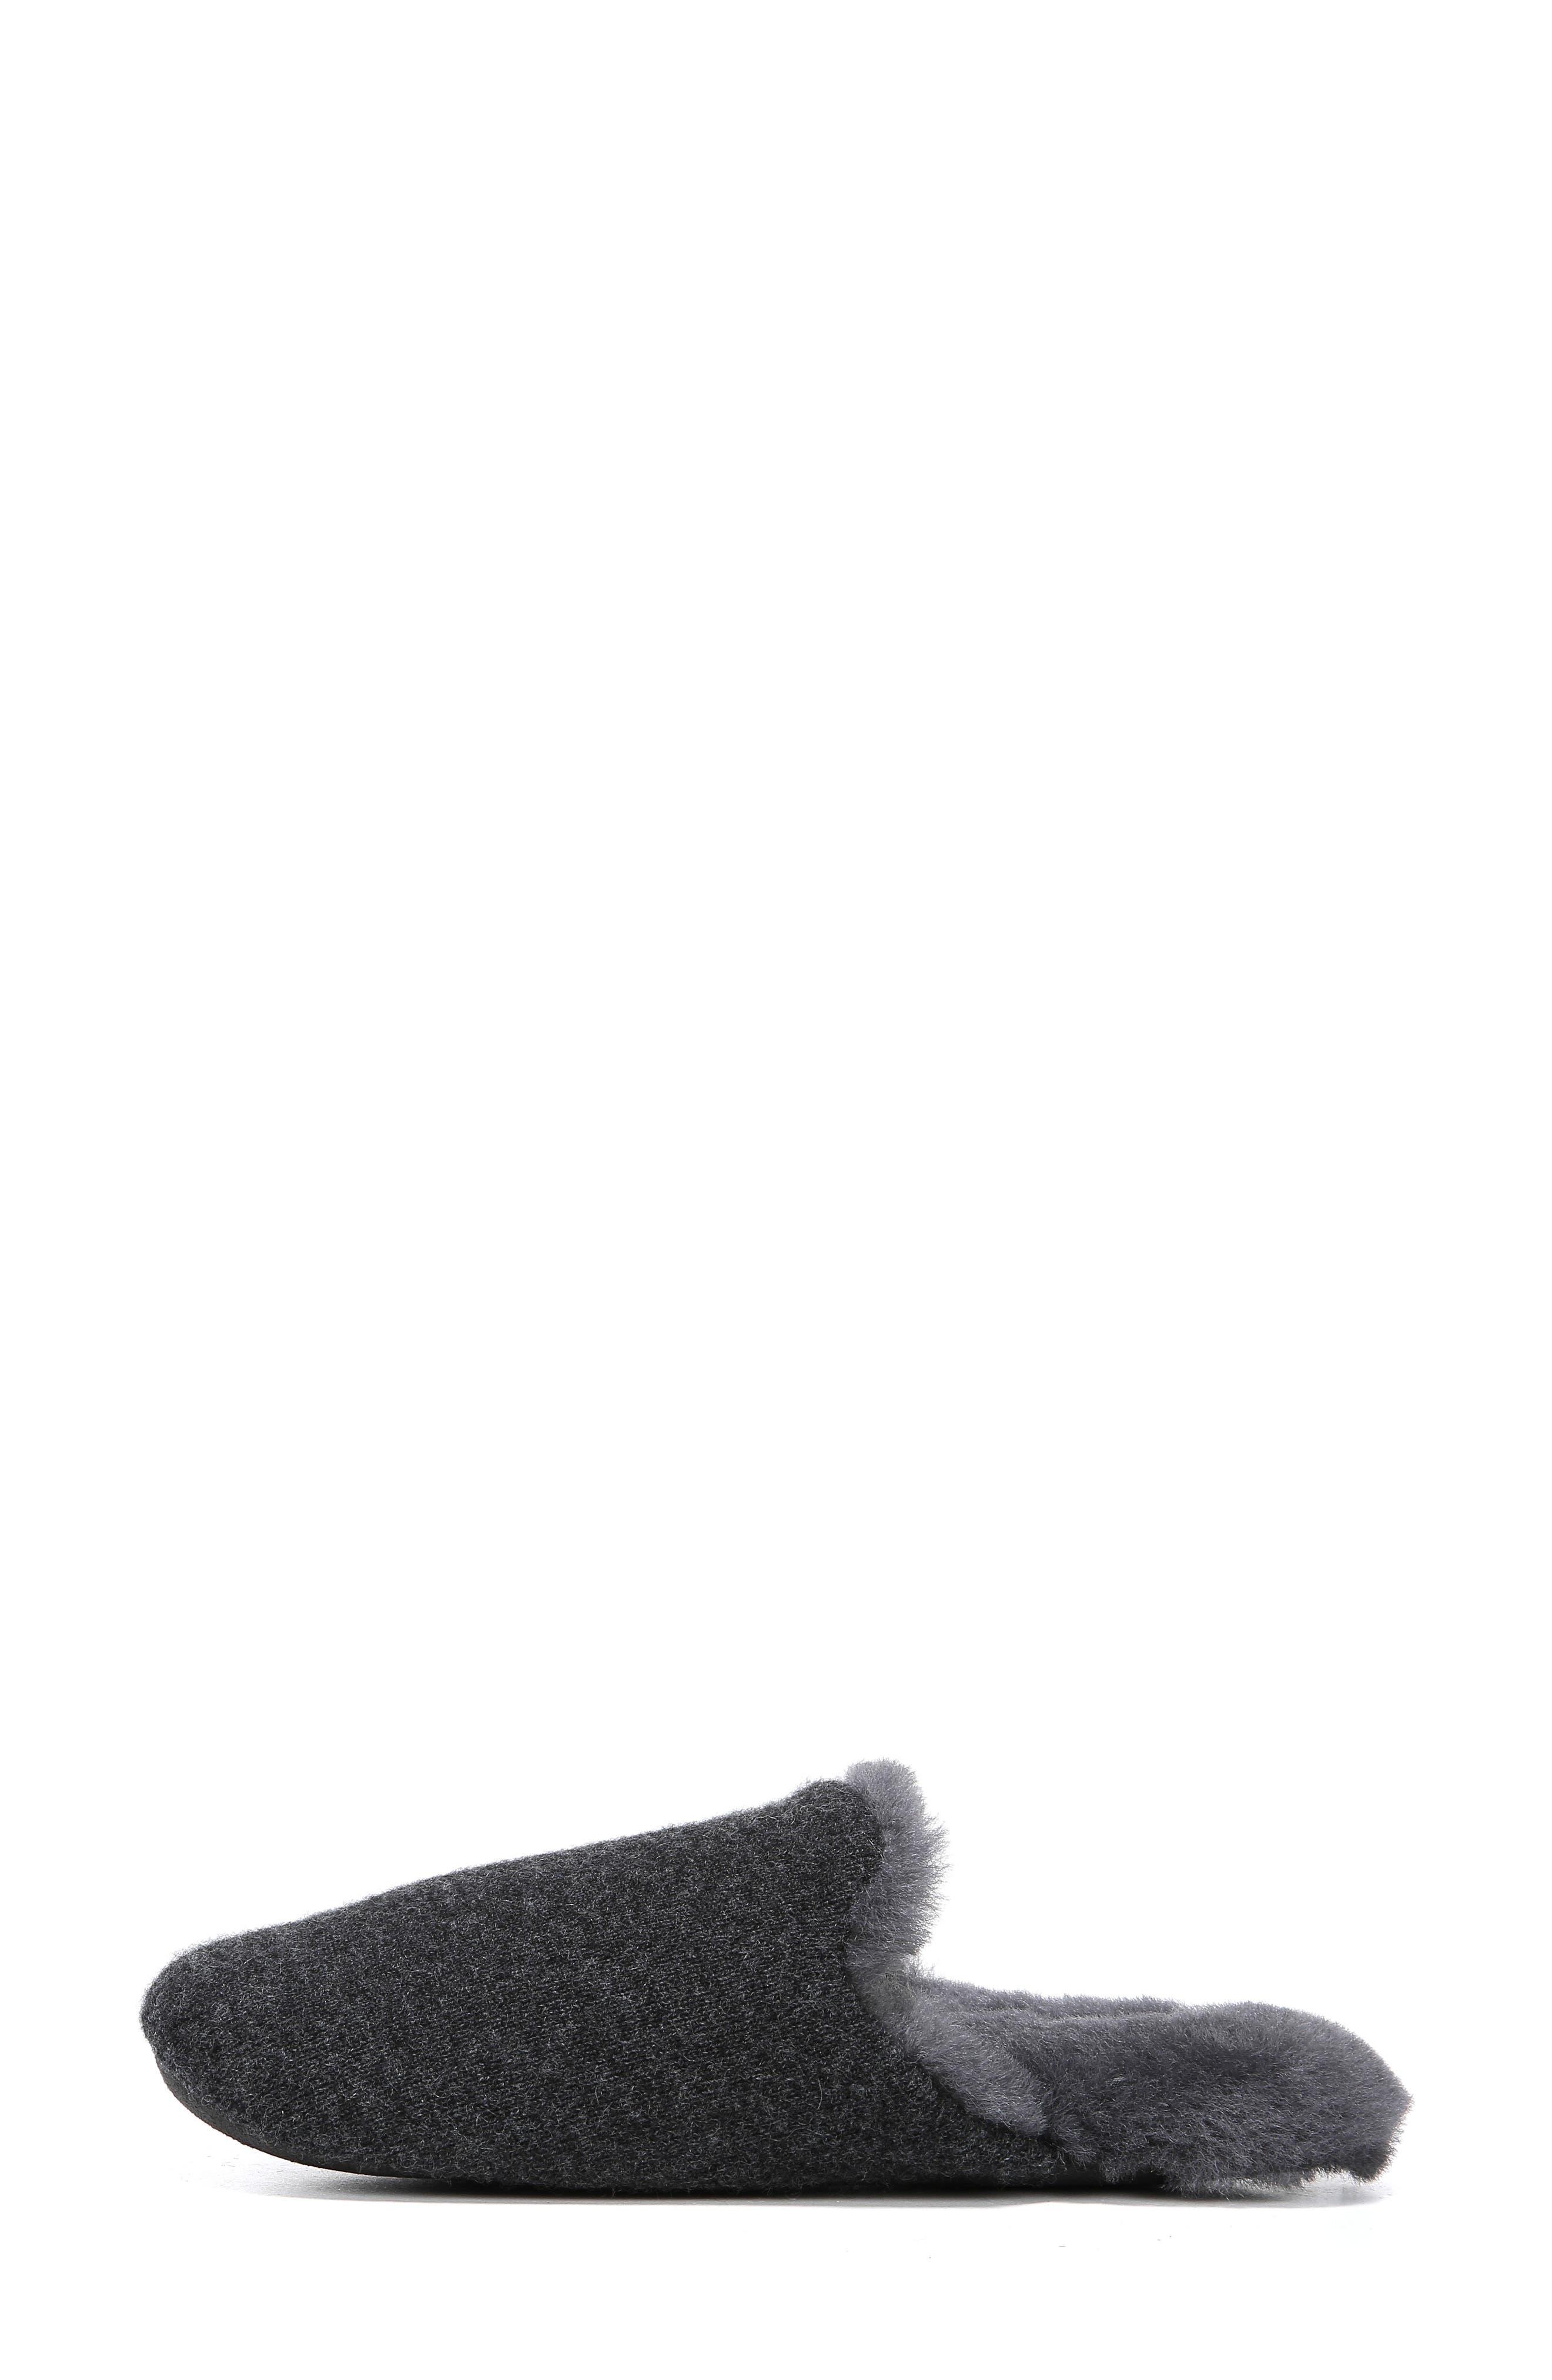 Cadie Genuine Shearling Slipper,                             Alternate thumbnail 9, color,                             CHARCOAL